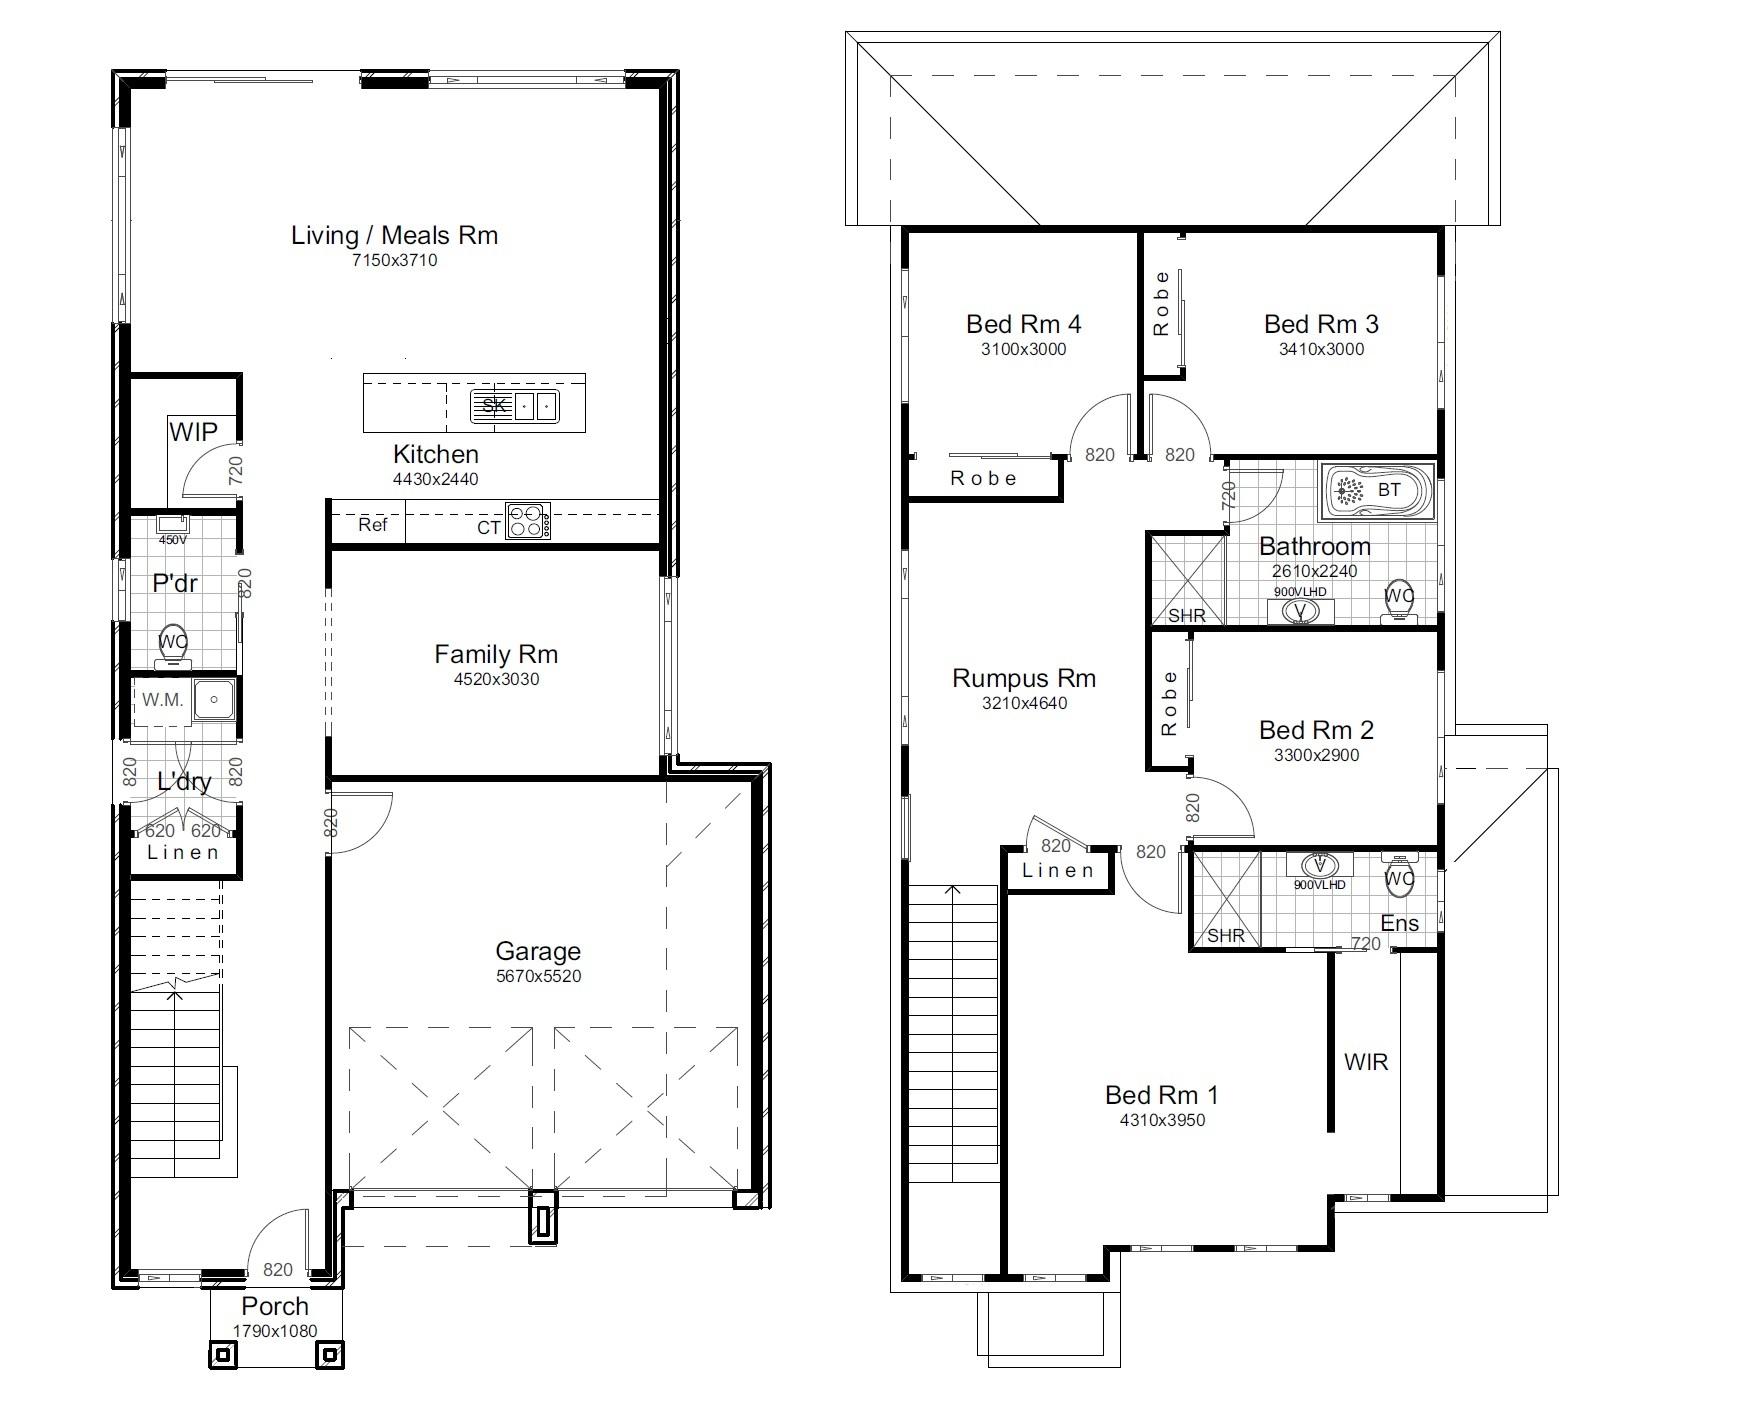 L11232404 AUSTRAL NSW 2179 - Floor plan